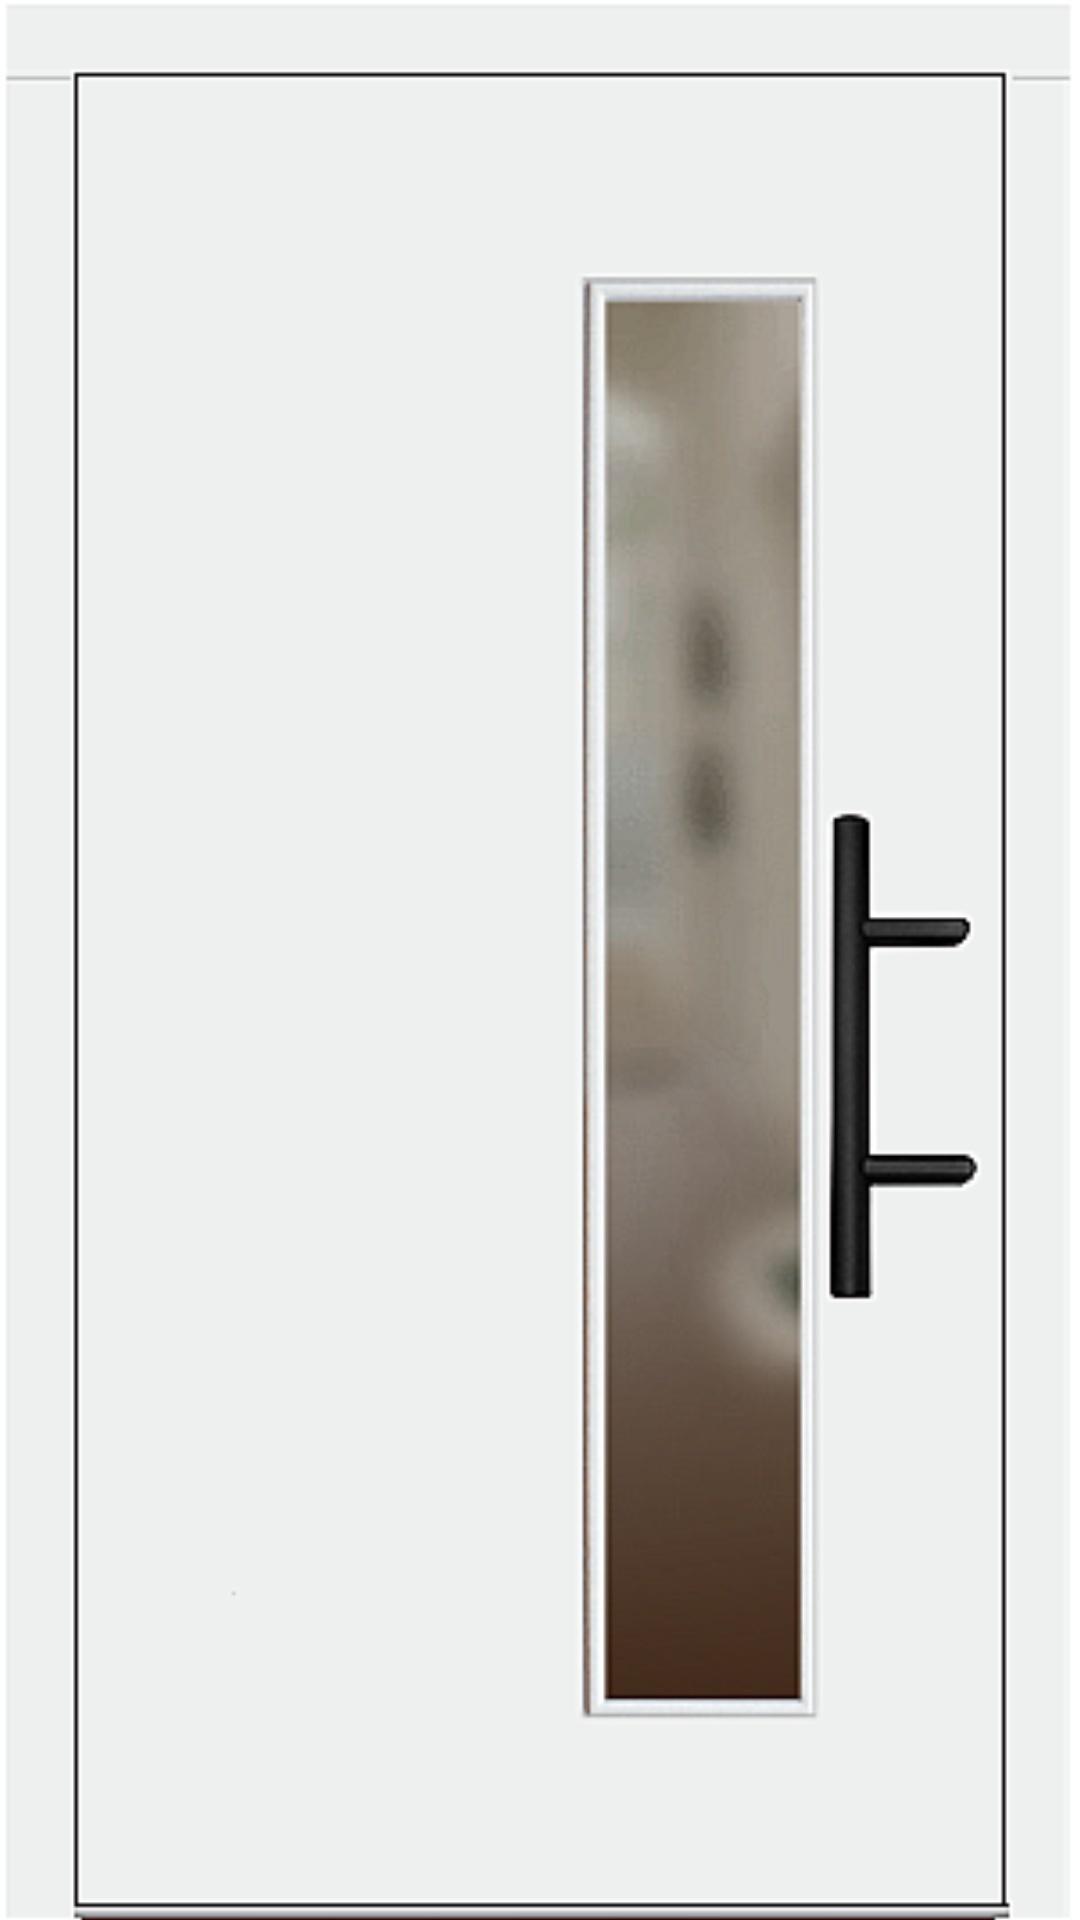 Holz Haustür Modell 8070 weiß